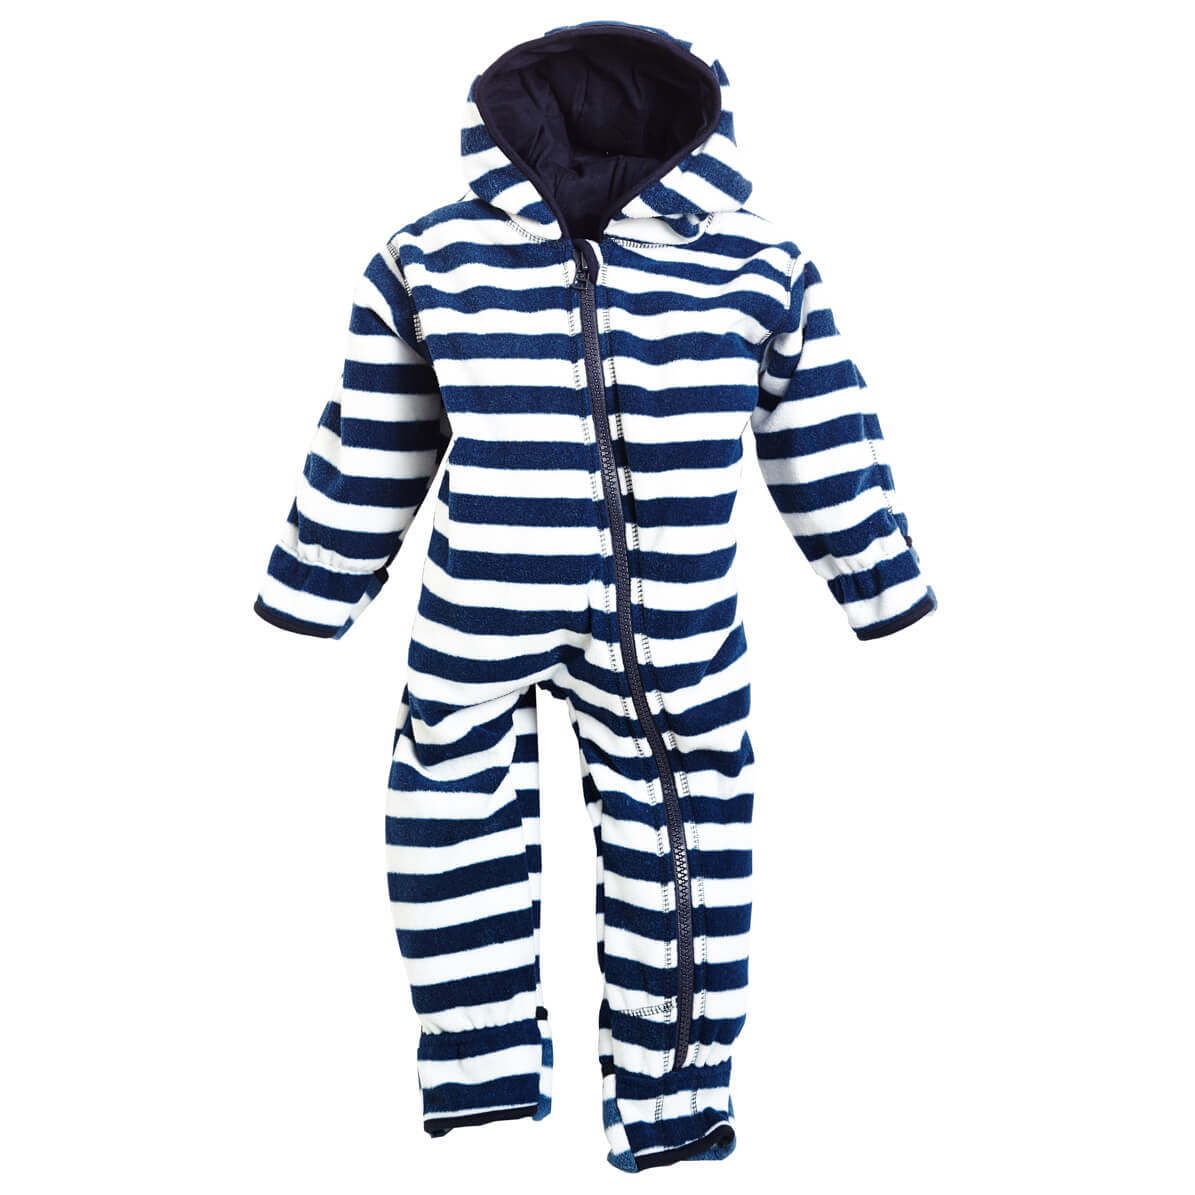 bms babyoverall antarctic clima fleece overalls kids. Black Bedroom Furniture Sets. Home Design Ideas